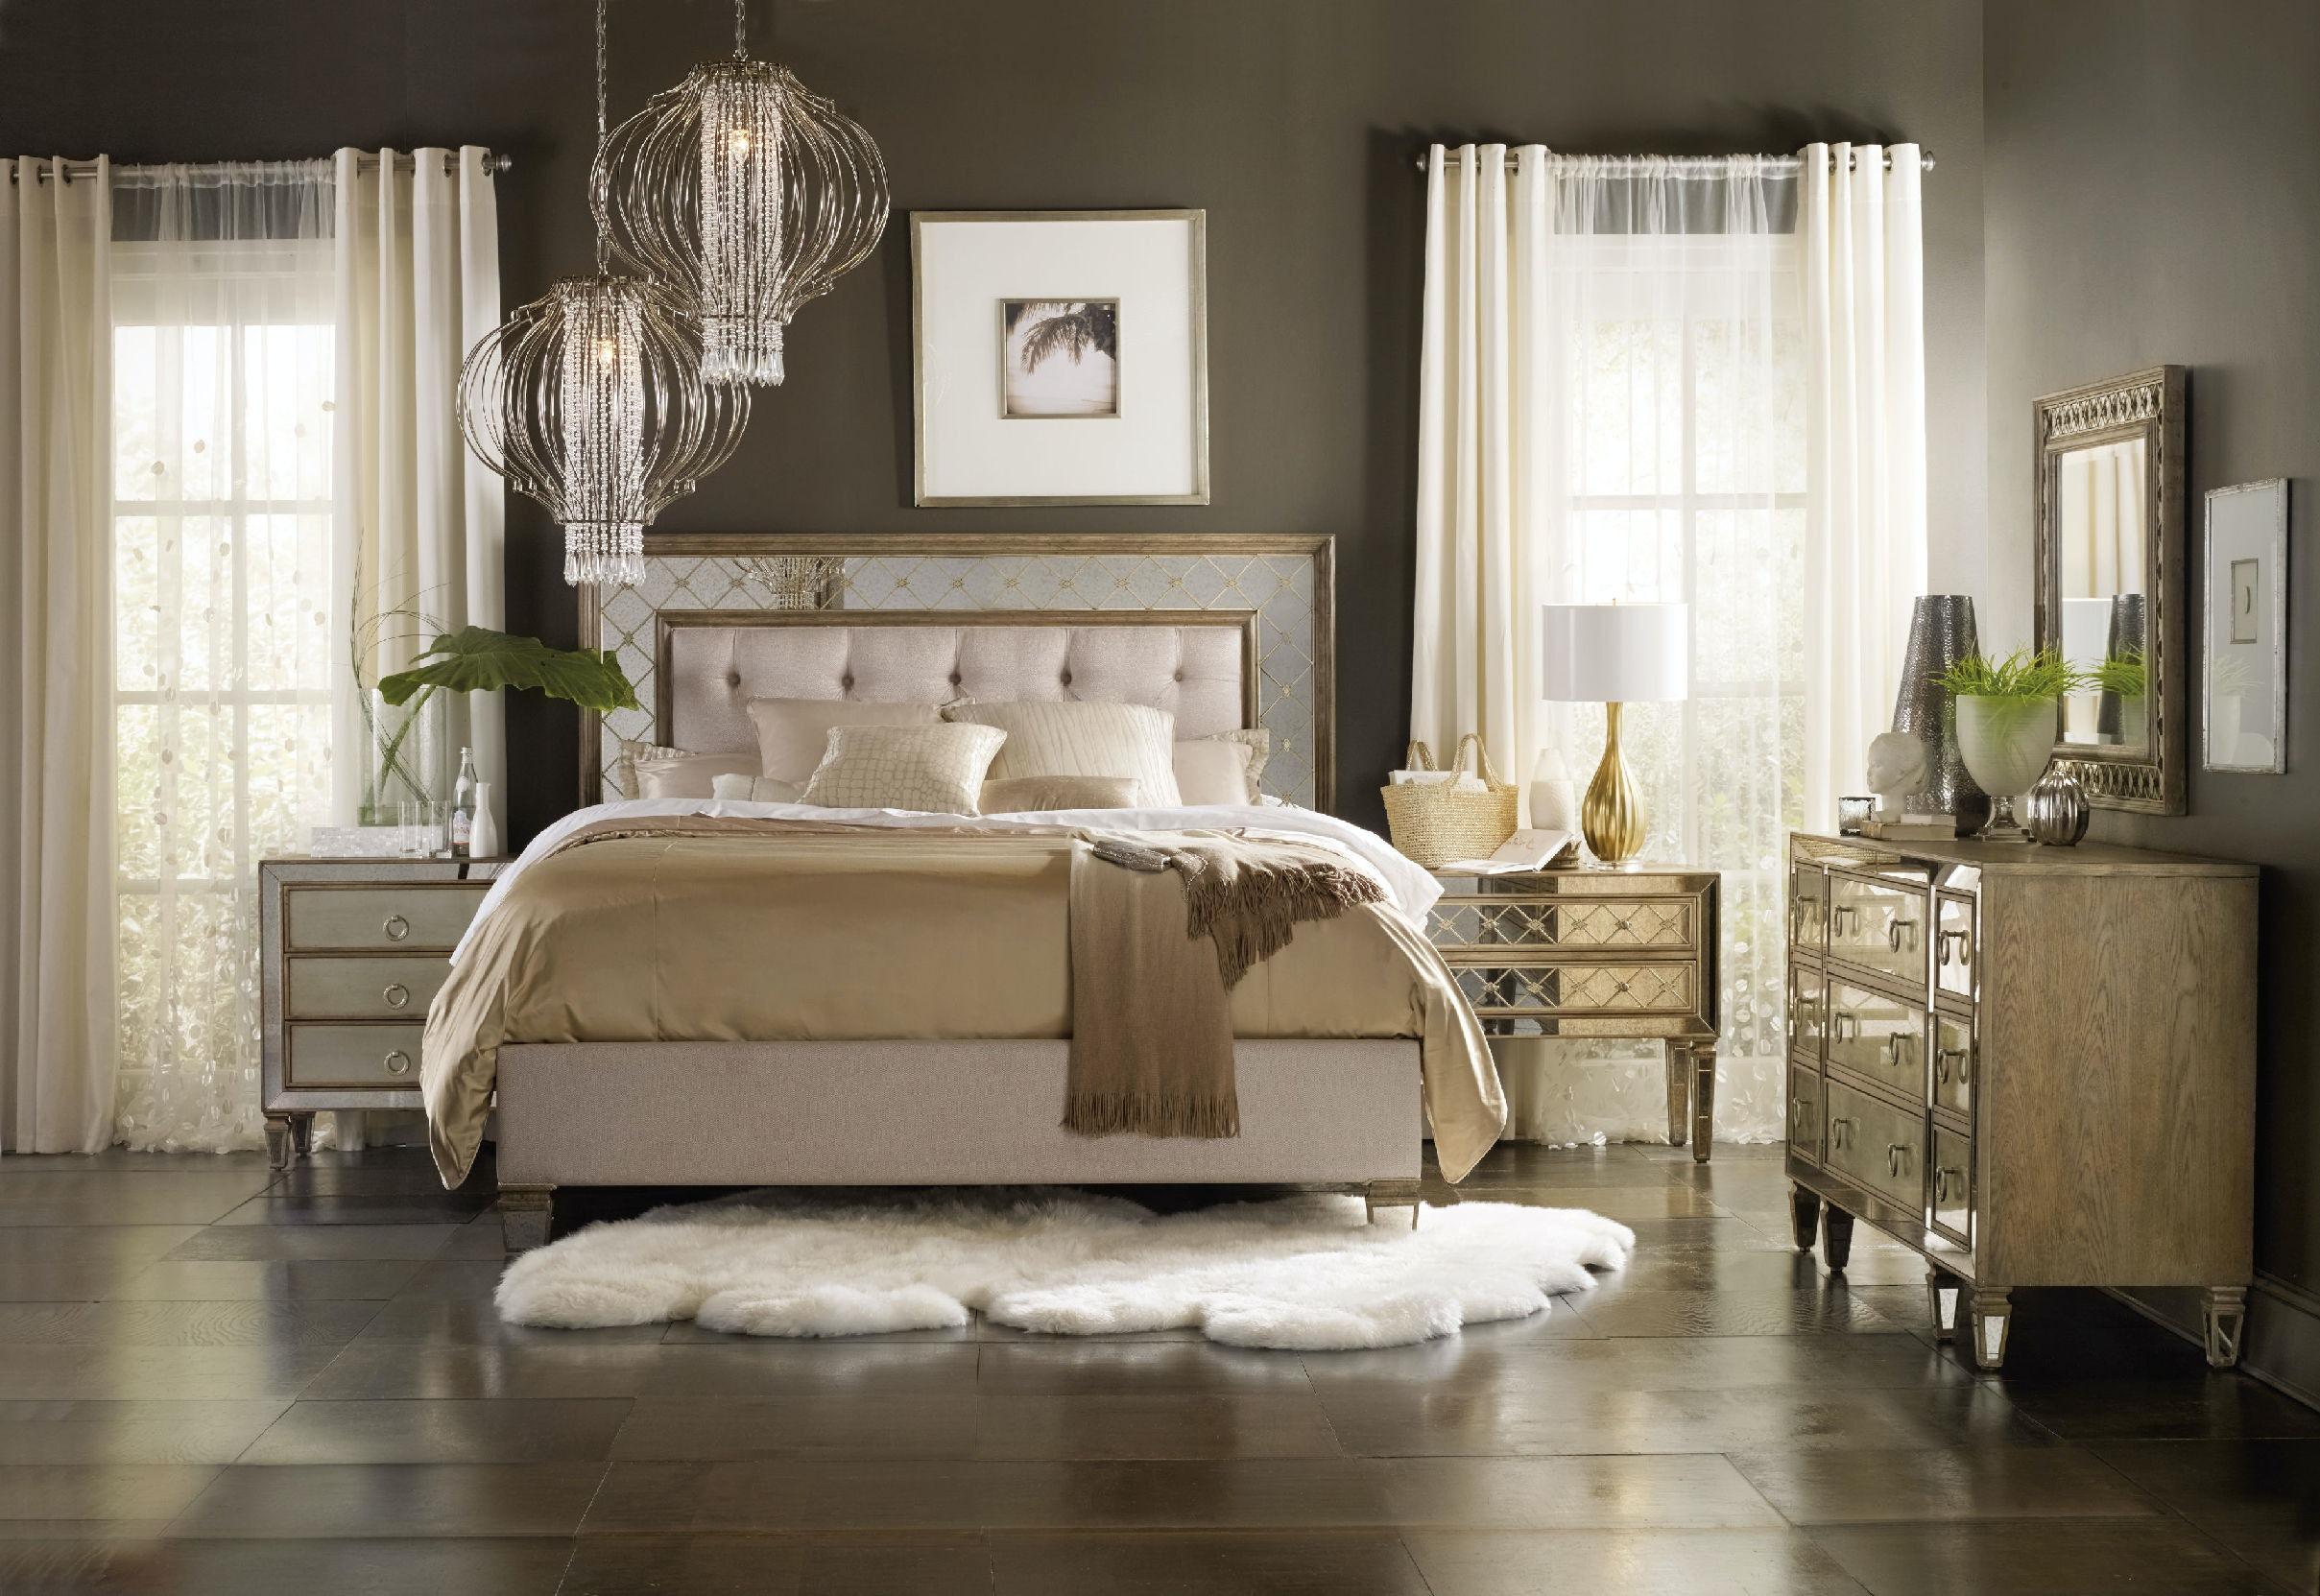 Superbe Hooker Furniture Sanctuary King Mirrored Upholstered Bed 5414 90866